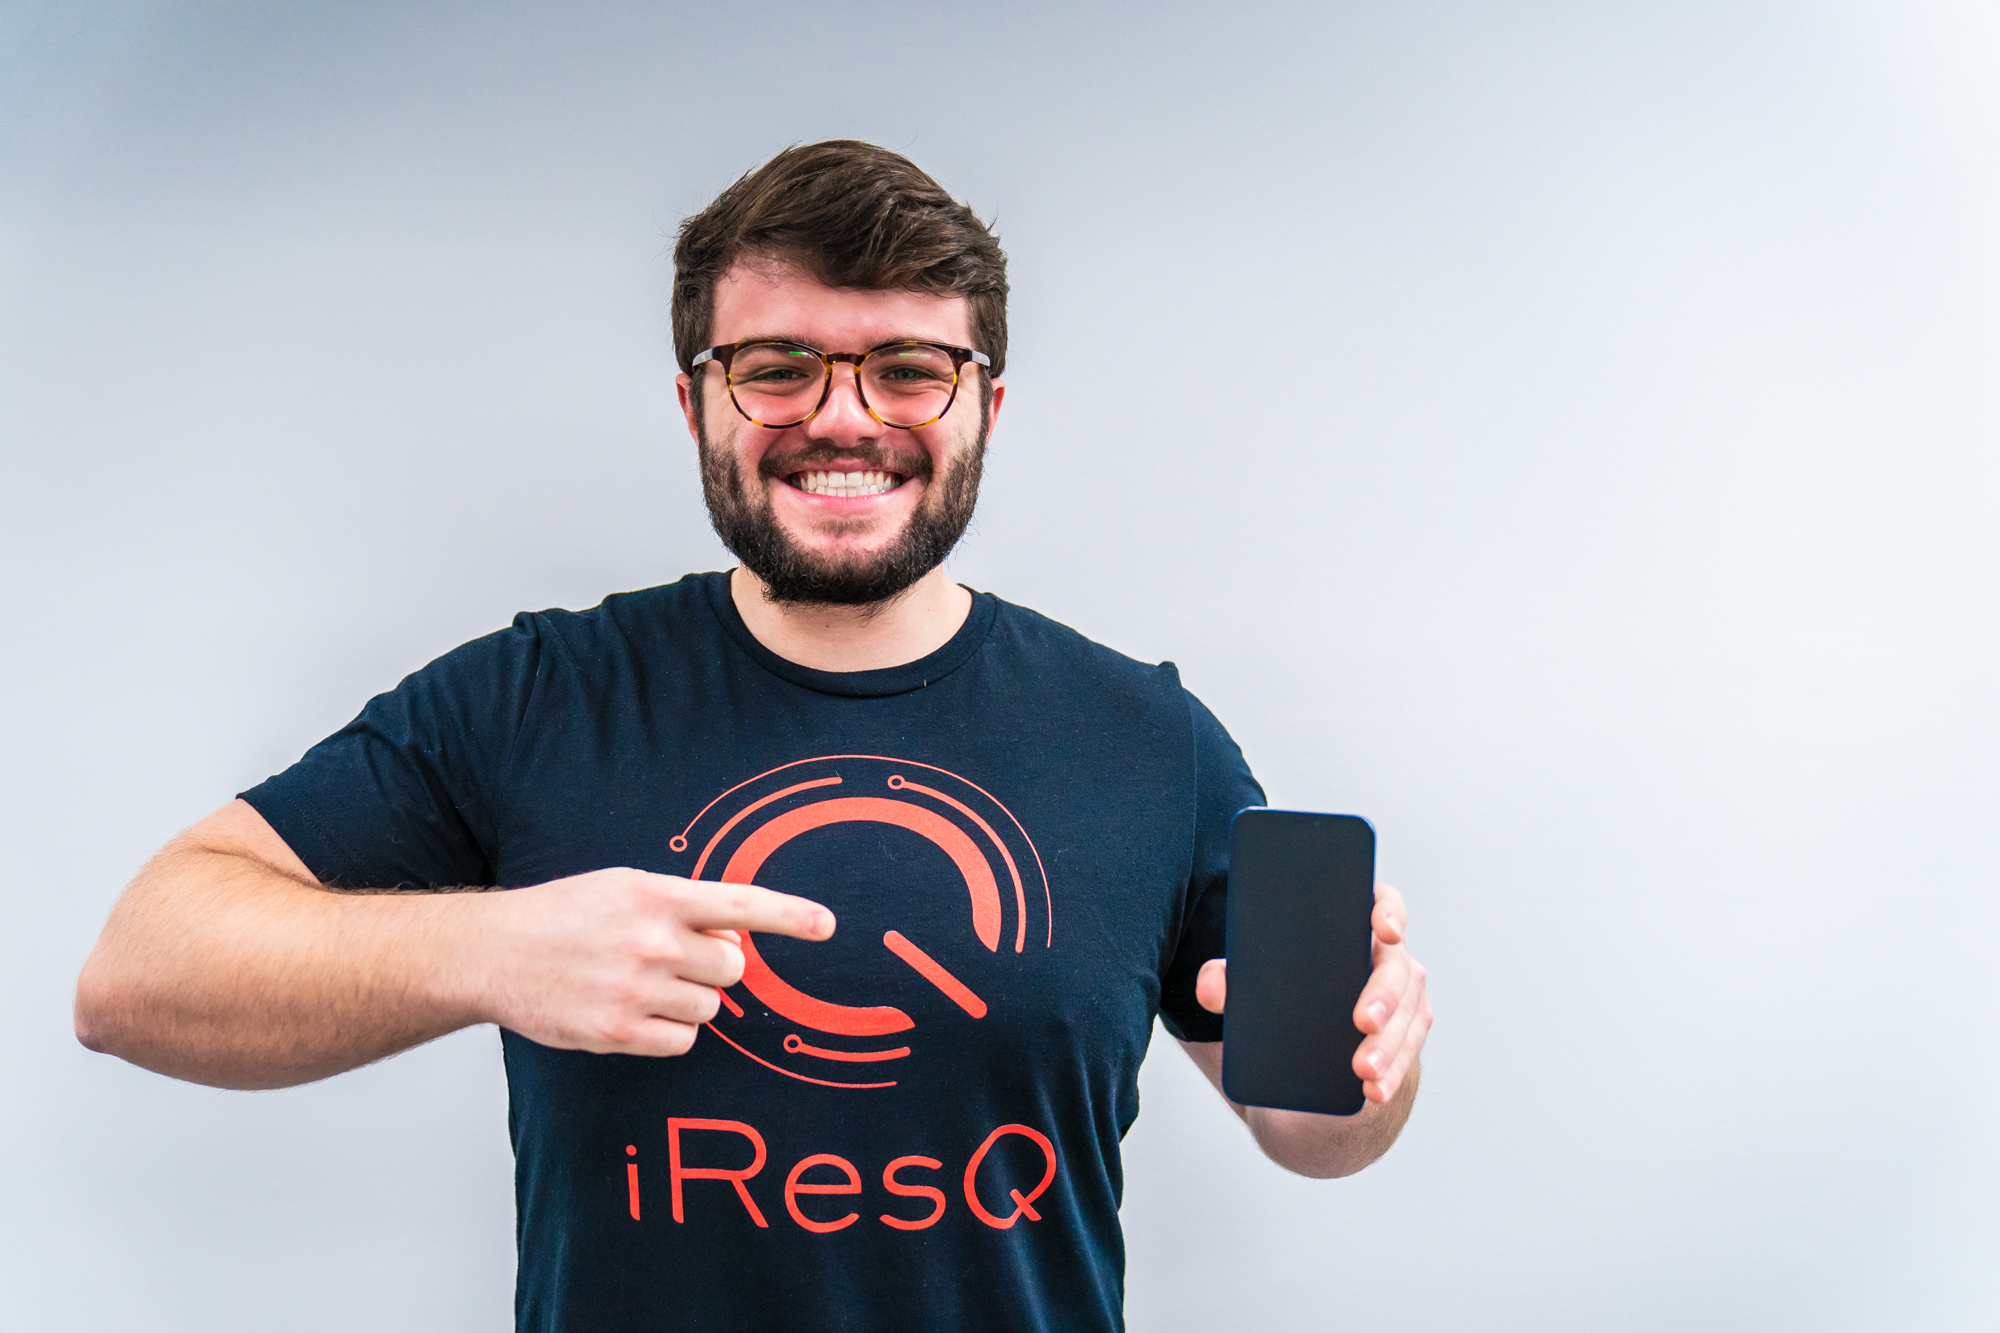 iresQ employee with phone